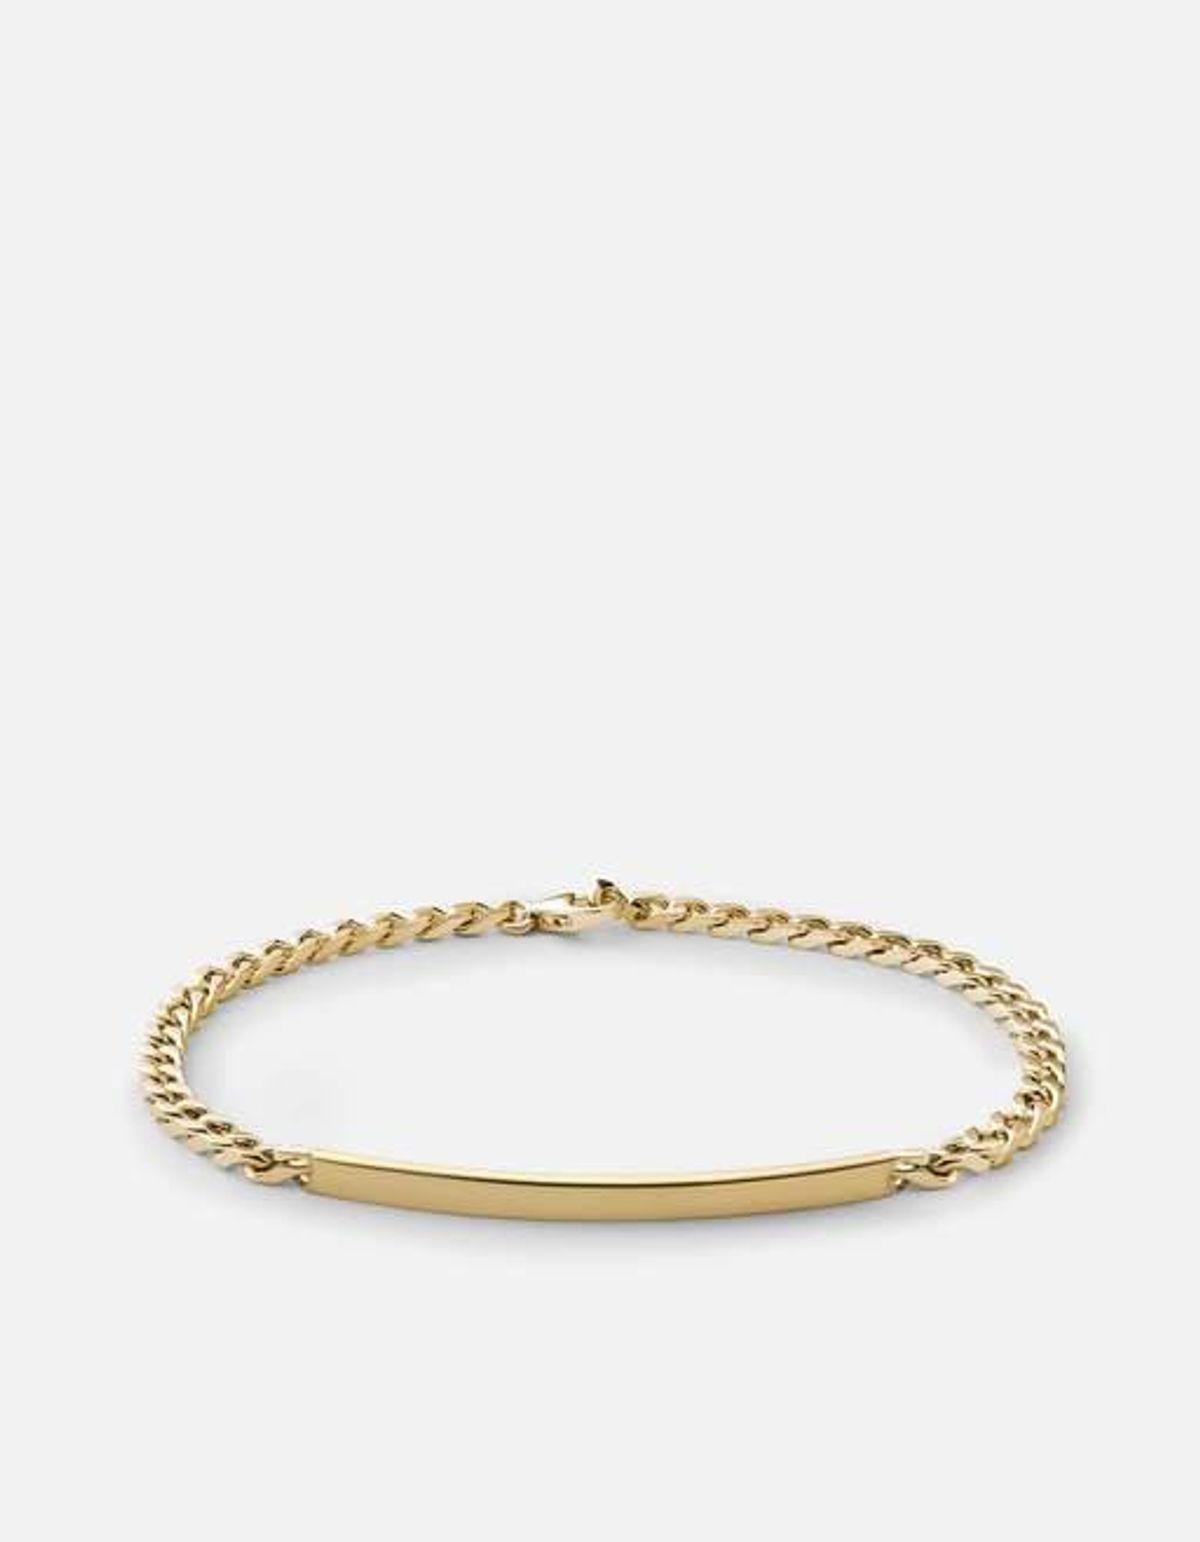 3mm ID Chain Bracelet